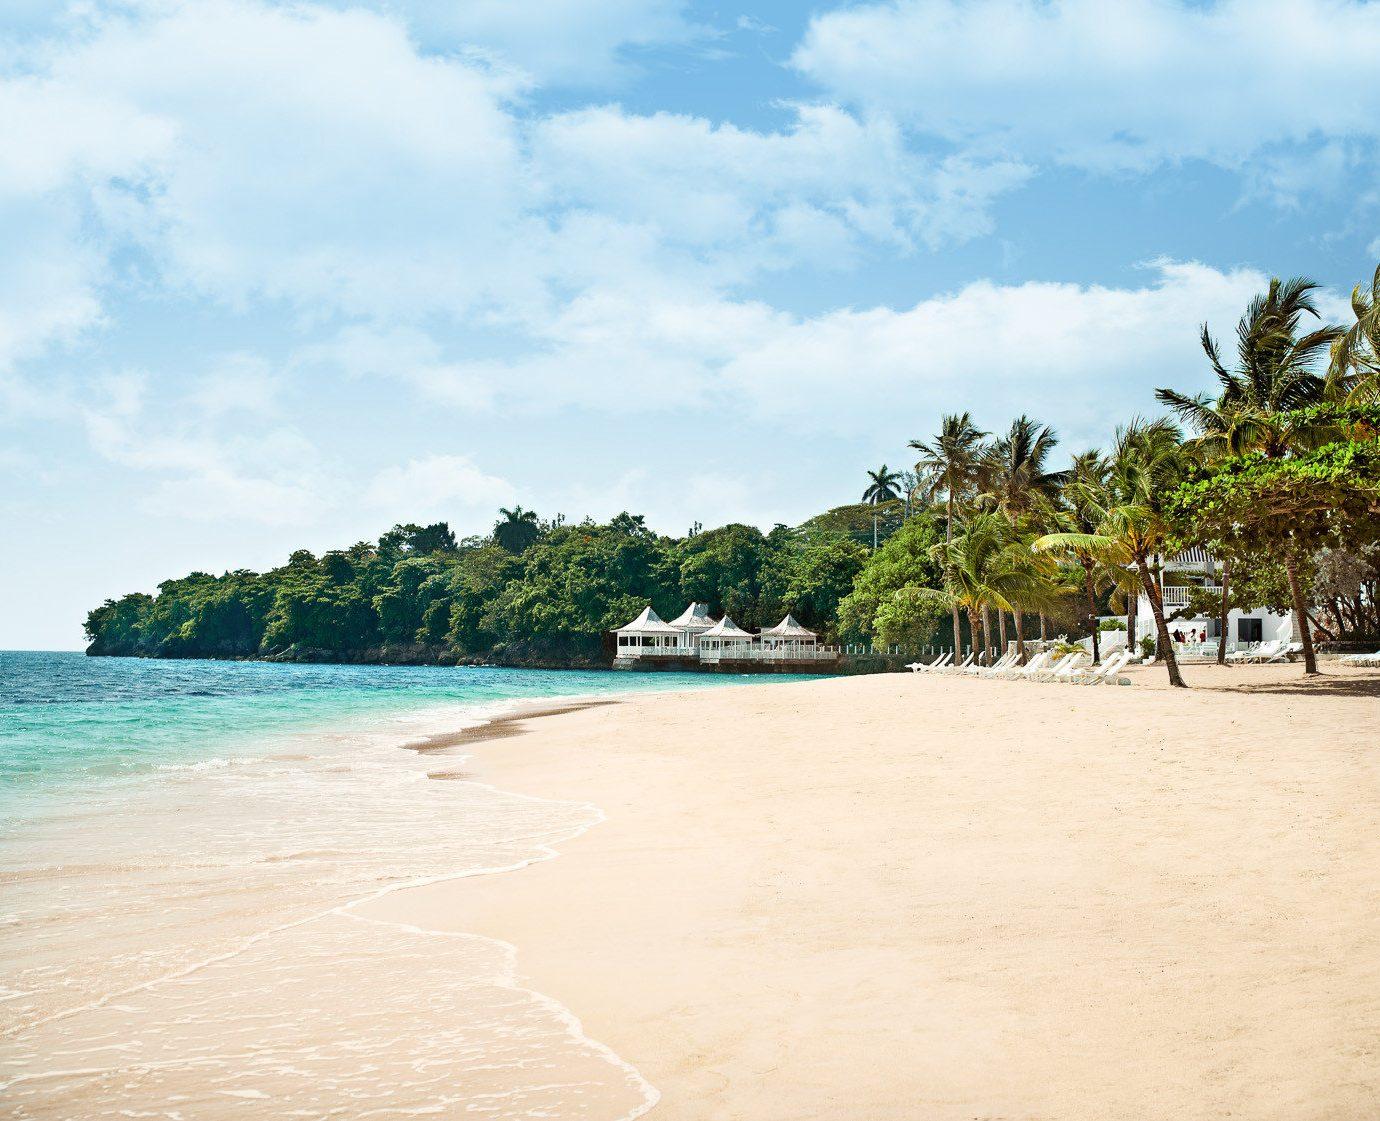 sky Beach water ground shore Sea Nature Ocean Coast caribbean tropics sand sandy arecales walkway day